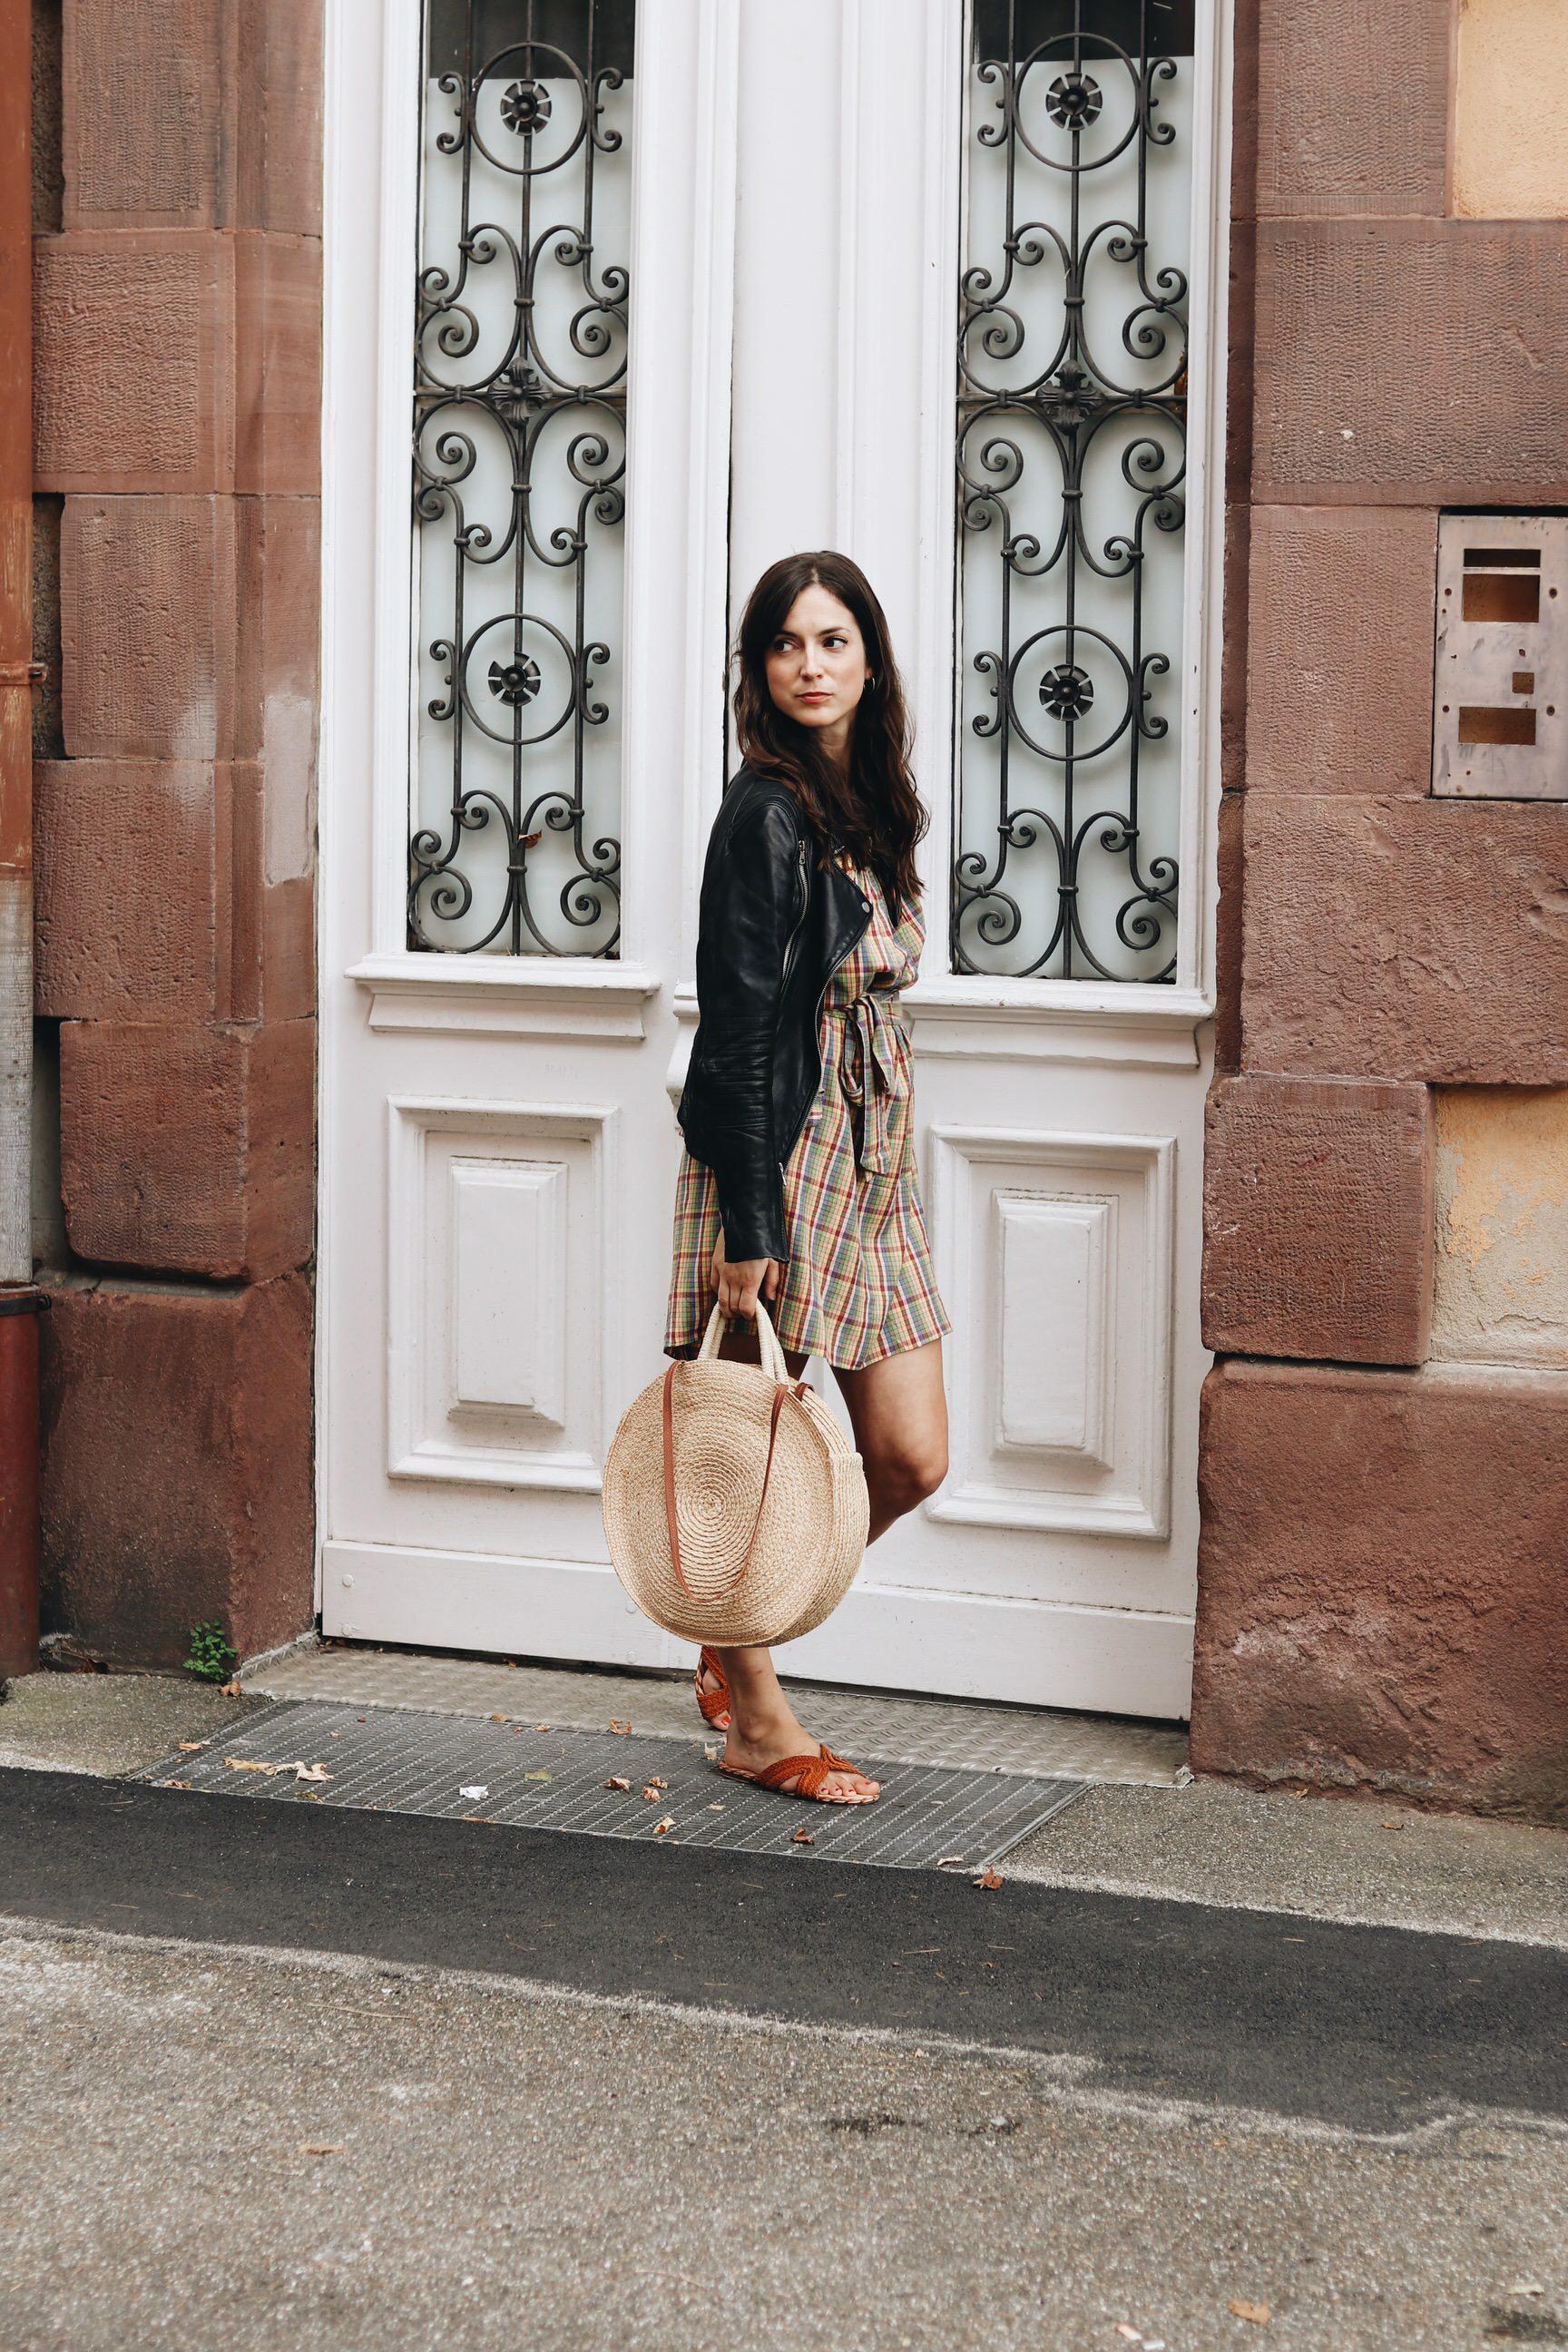 Fair Fashion Outfit Blog nachhaltig Korbtasche Lederjacke schwarz Fransen Modeblog